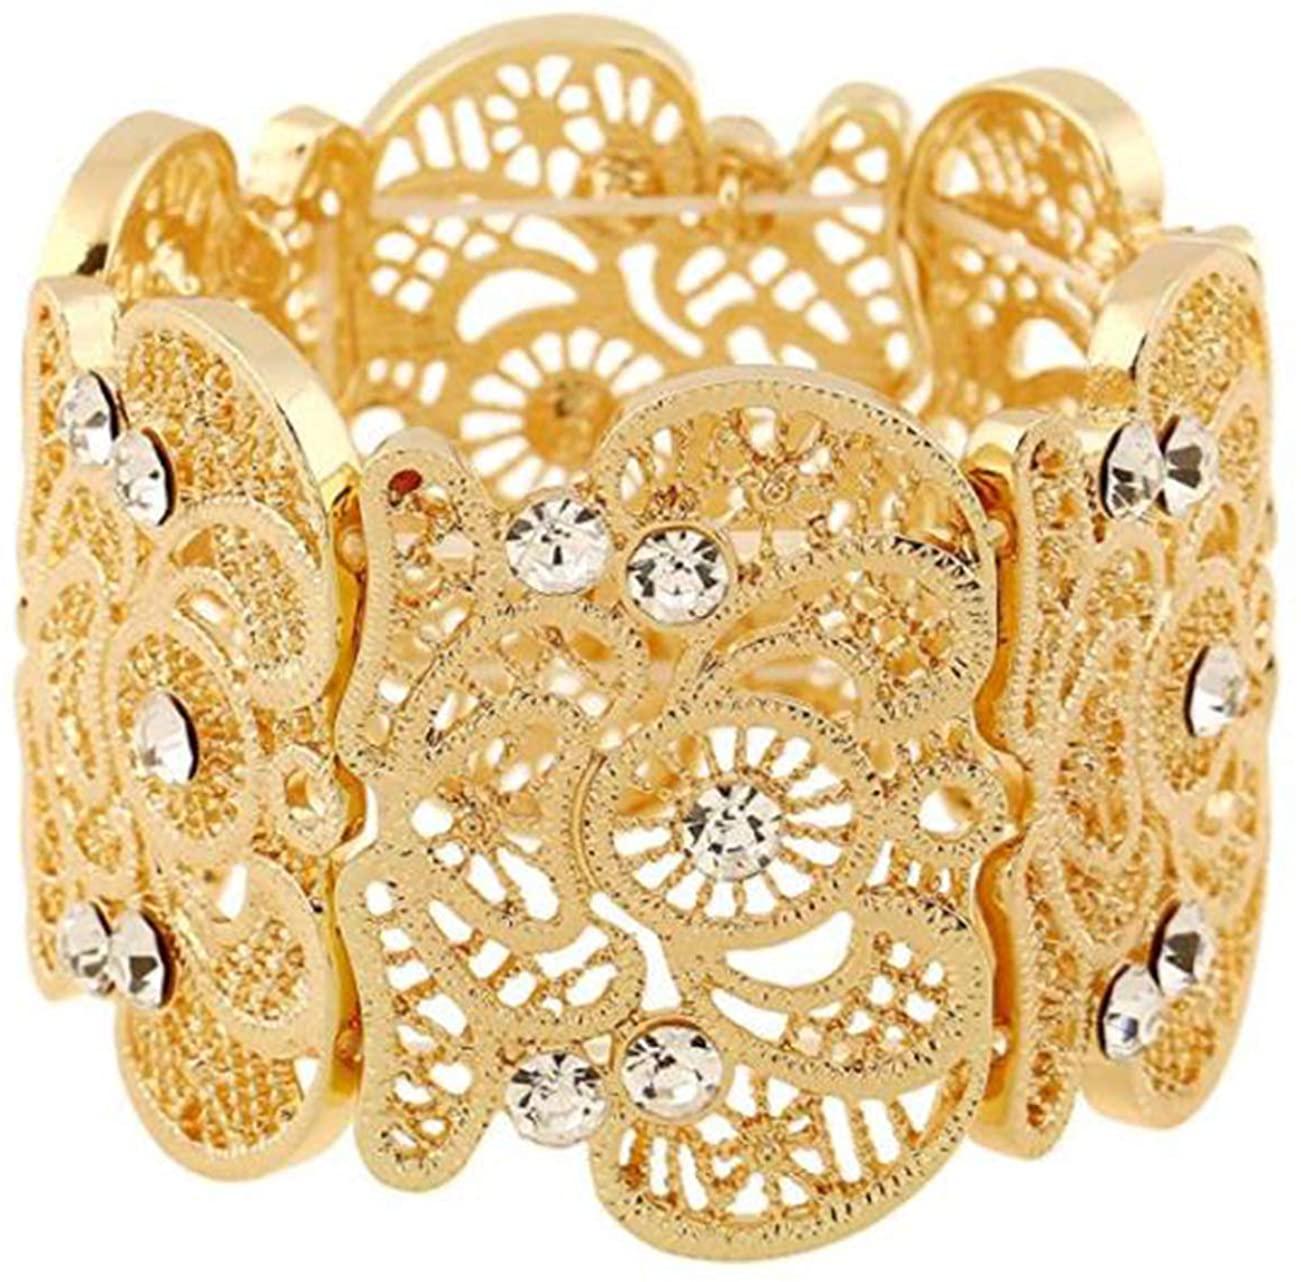 SL SweetLove Women's Rhinestone Stretch Bracelets-Flower Hollow Cuff Bangle for Ladies 6.5-7''